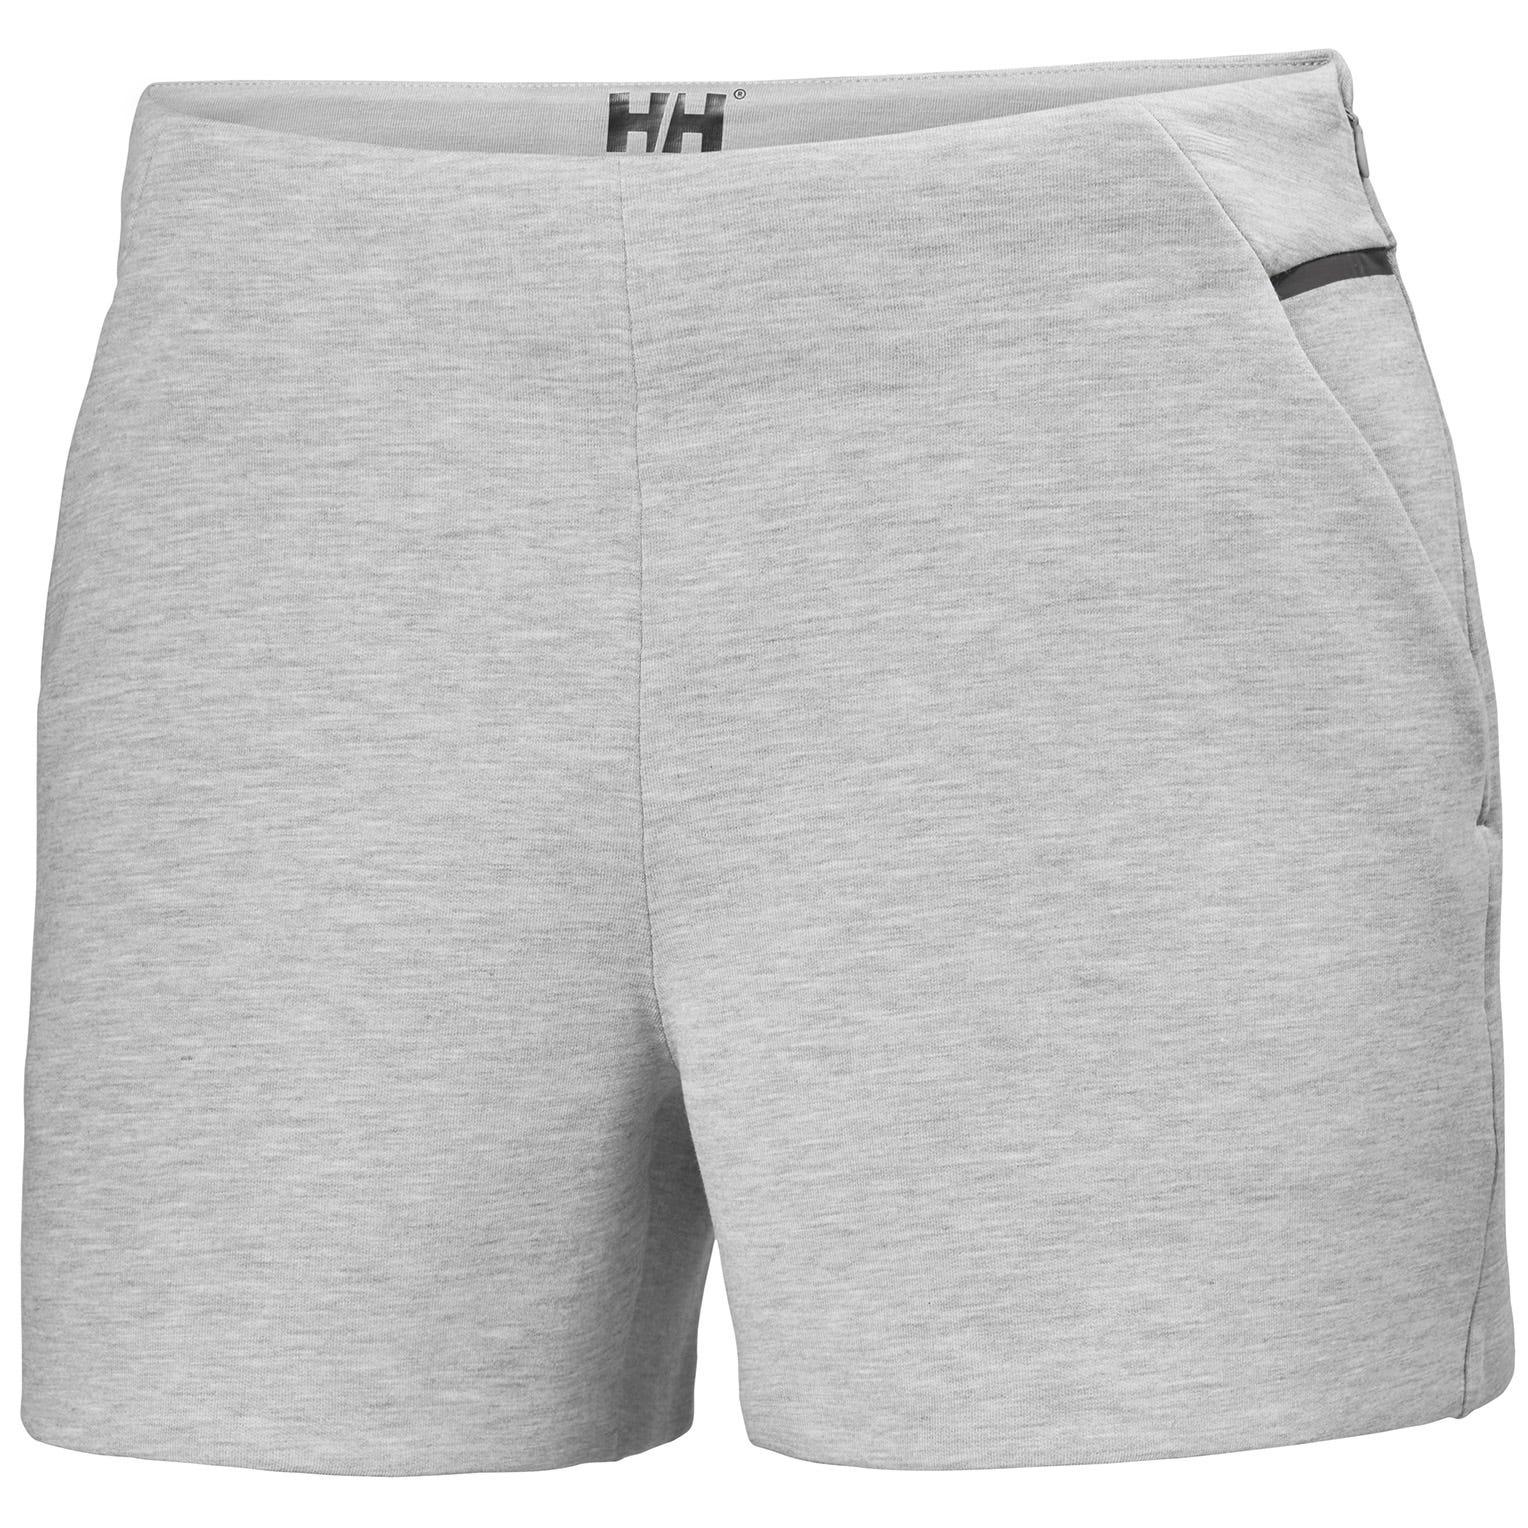 Helly Hansen Women's Hp Ocean Sweat Shorts Grey XS